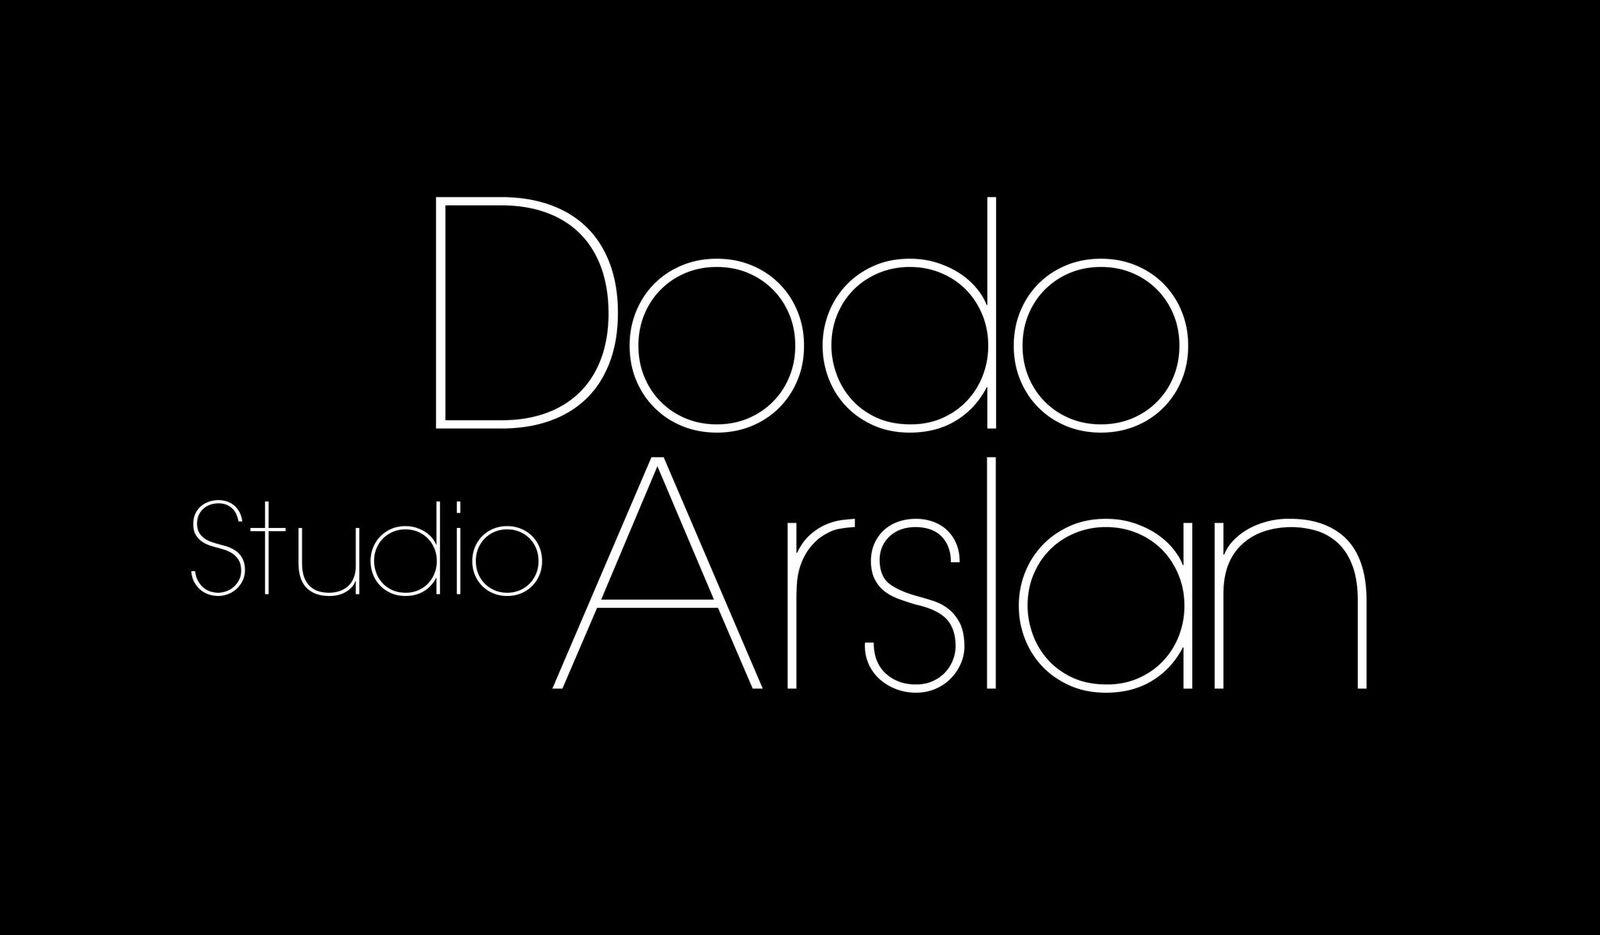 Dodo Arslan, LLC.